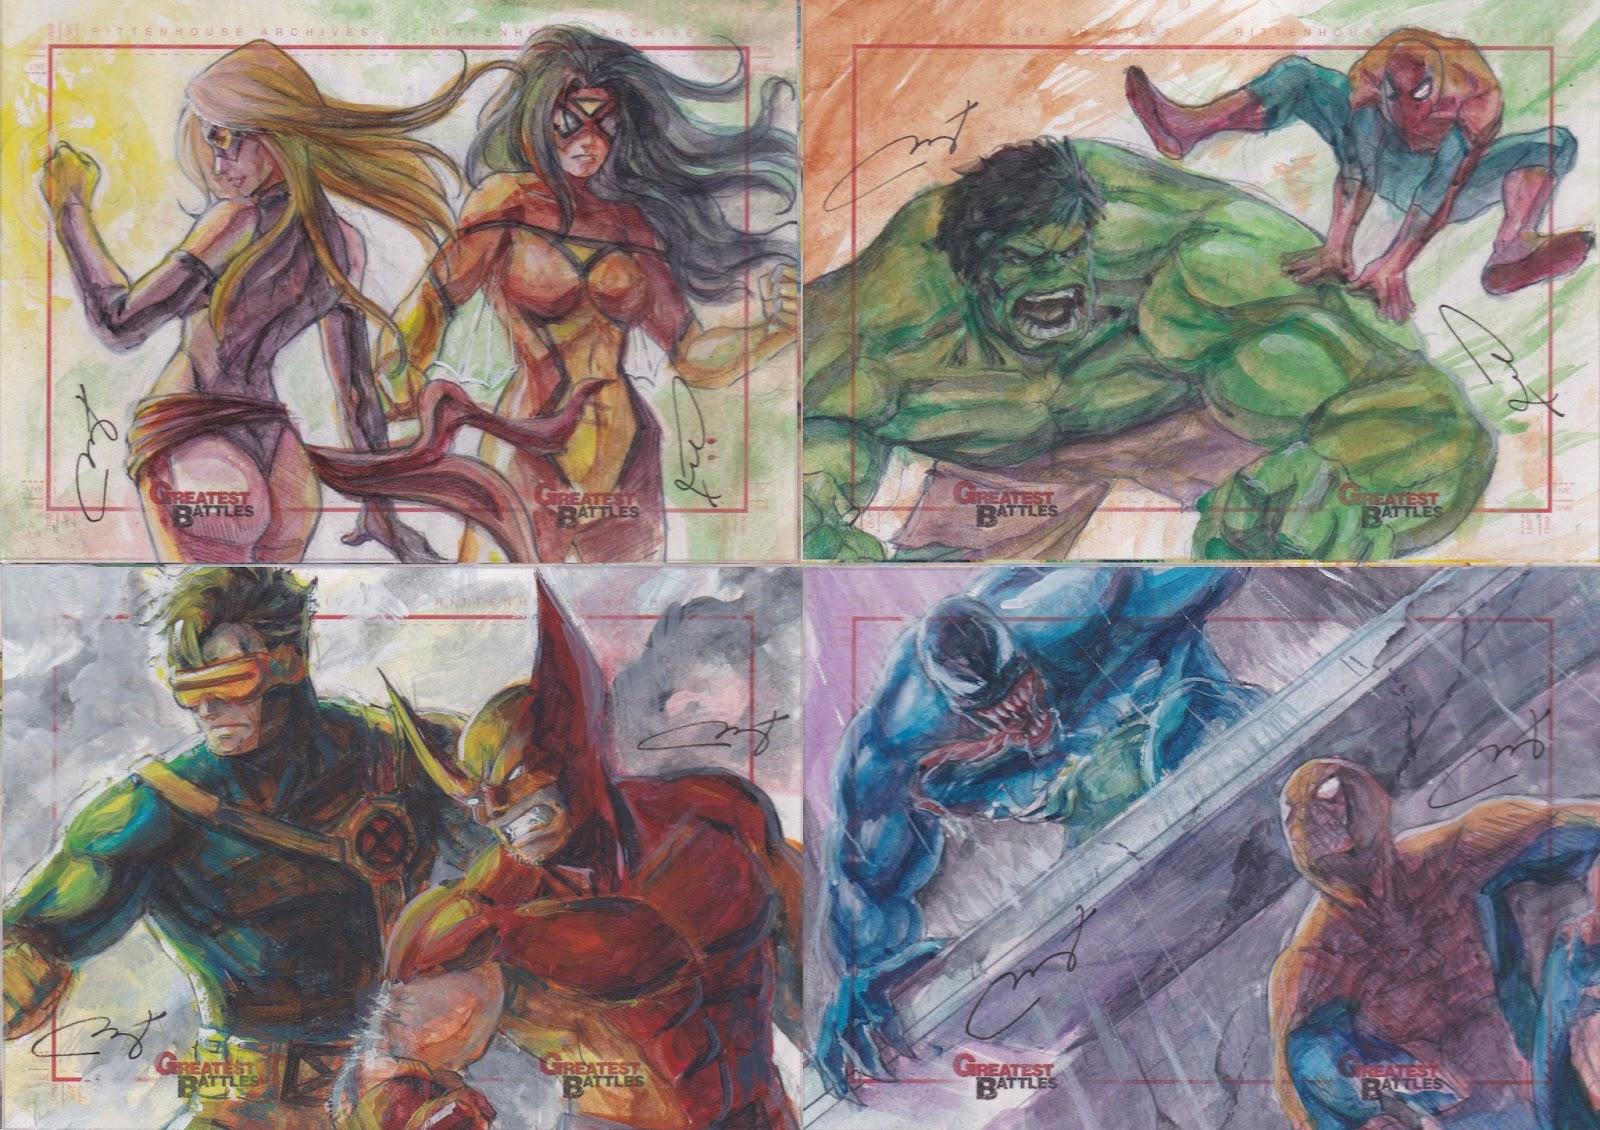 Képek - Page 8 Mary-jane-pajaron_MarvelGreatestBattles-1